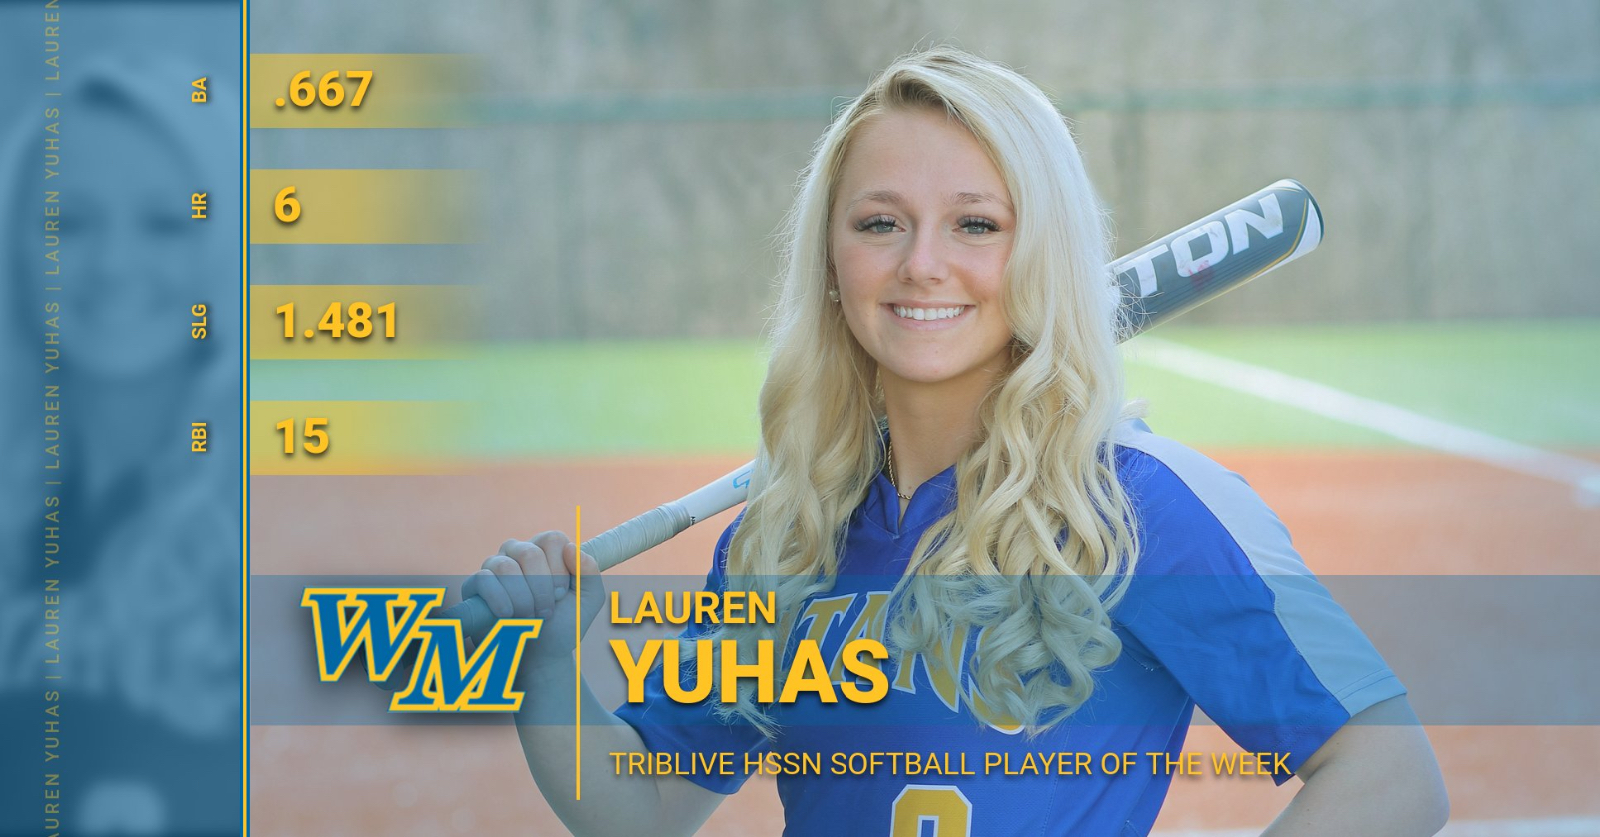 Lauren Yuhas Named Softball Player of the Week